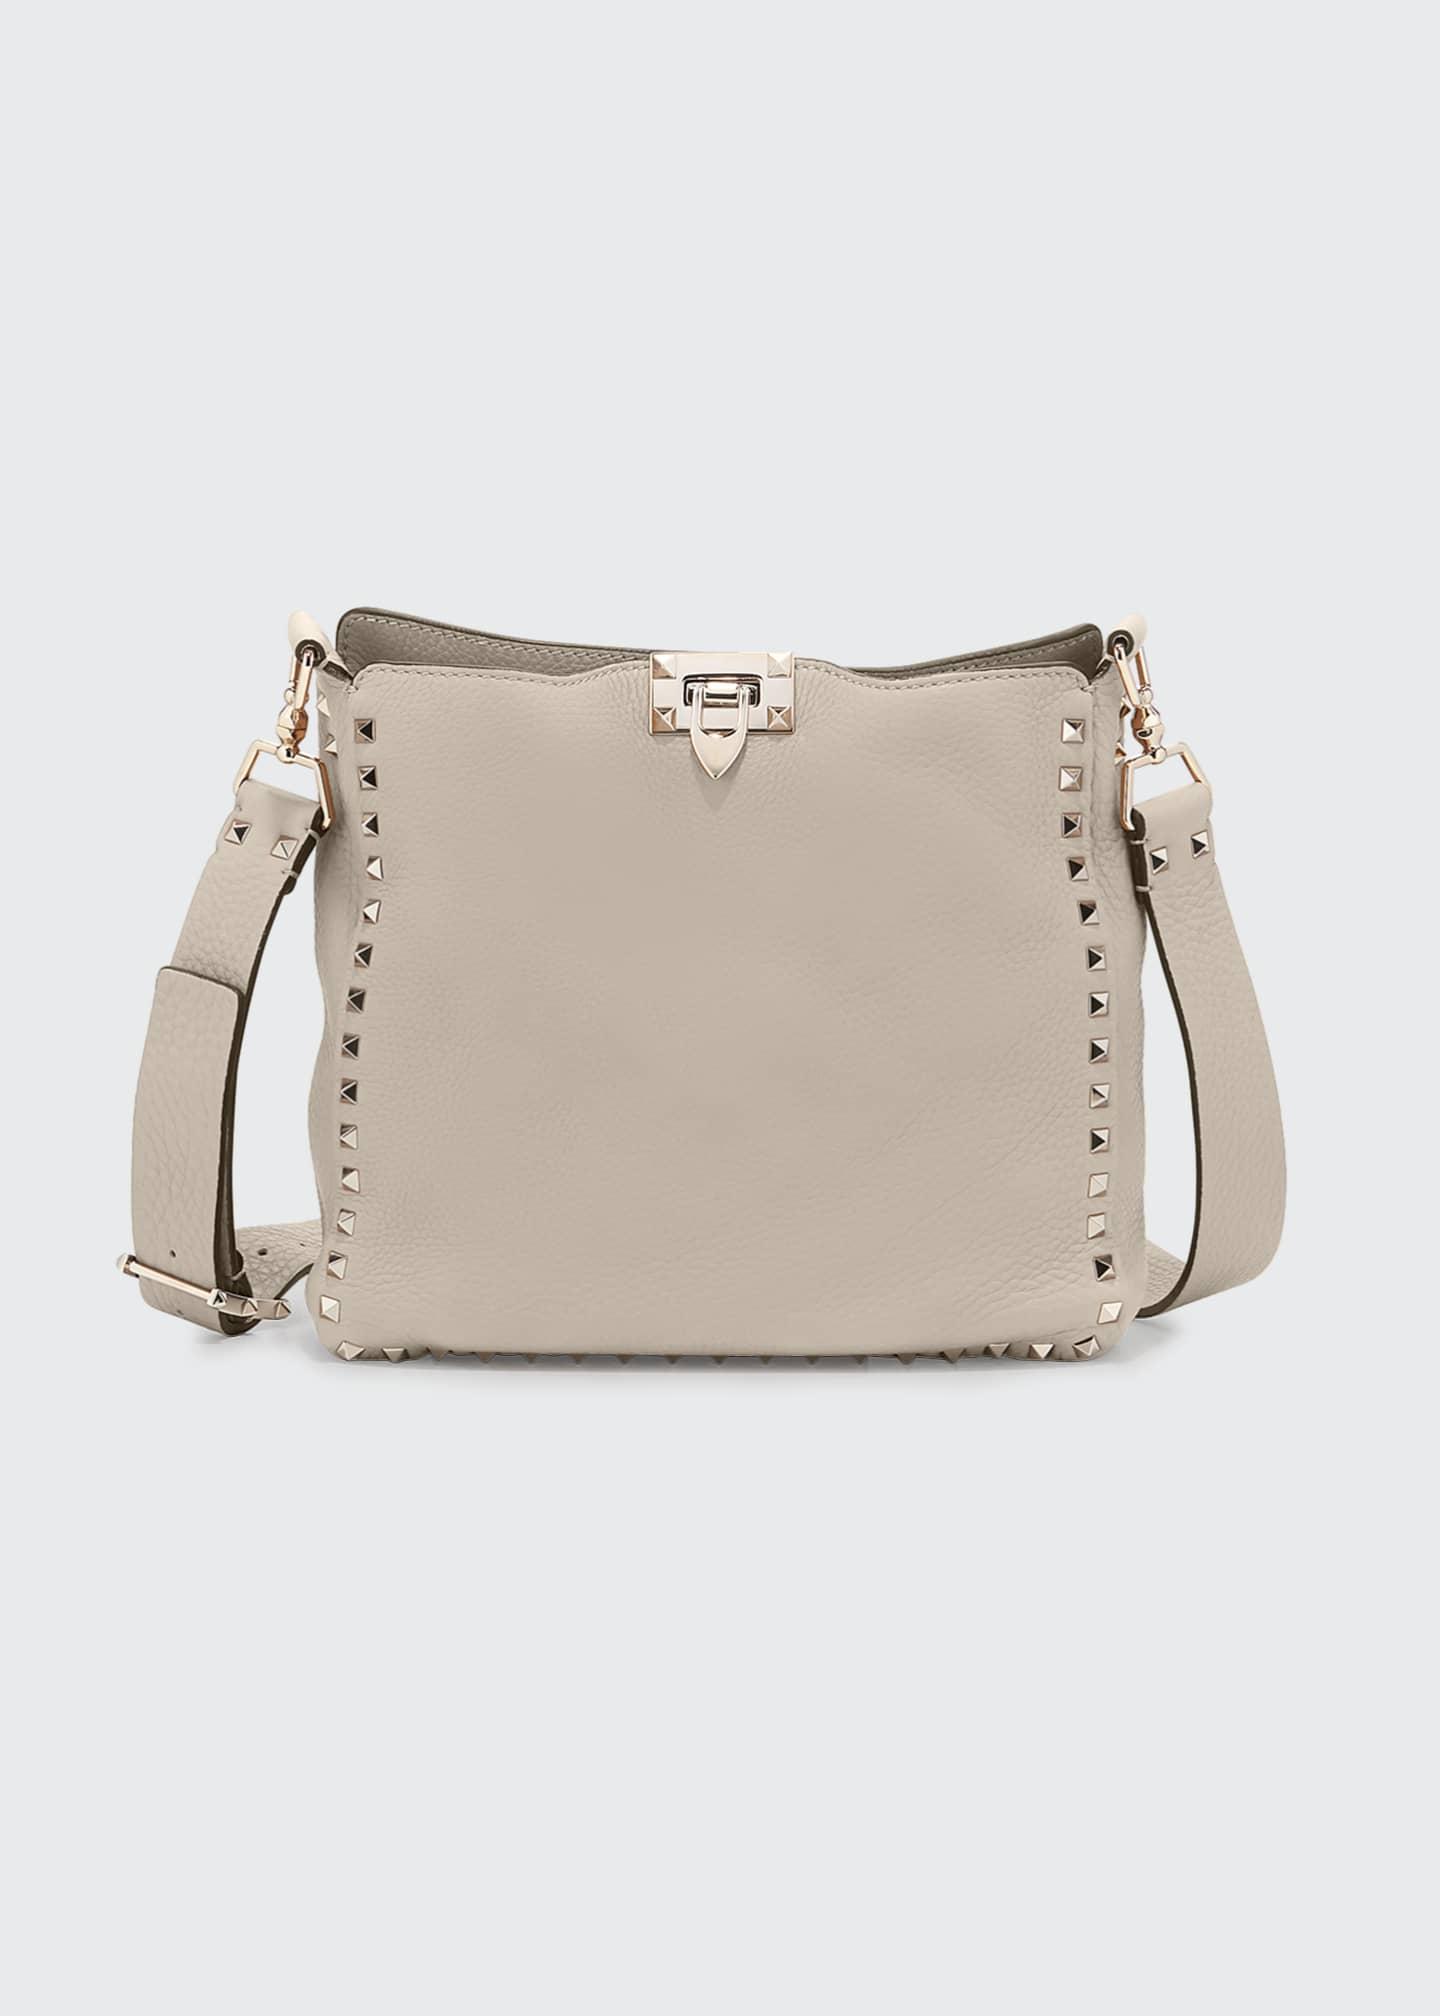 Valentino Garavani Rockstud Small Leather Hobo Bag